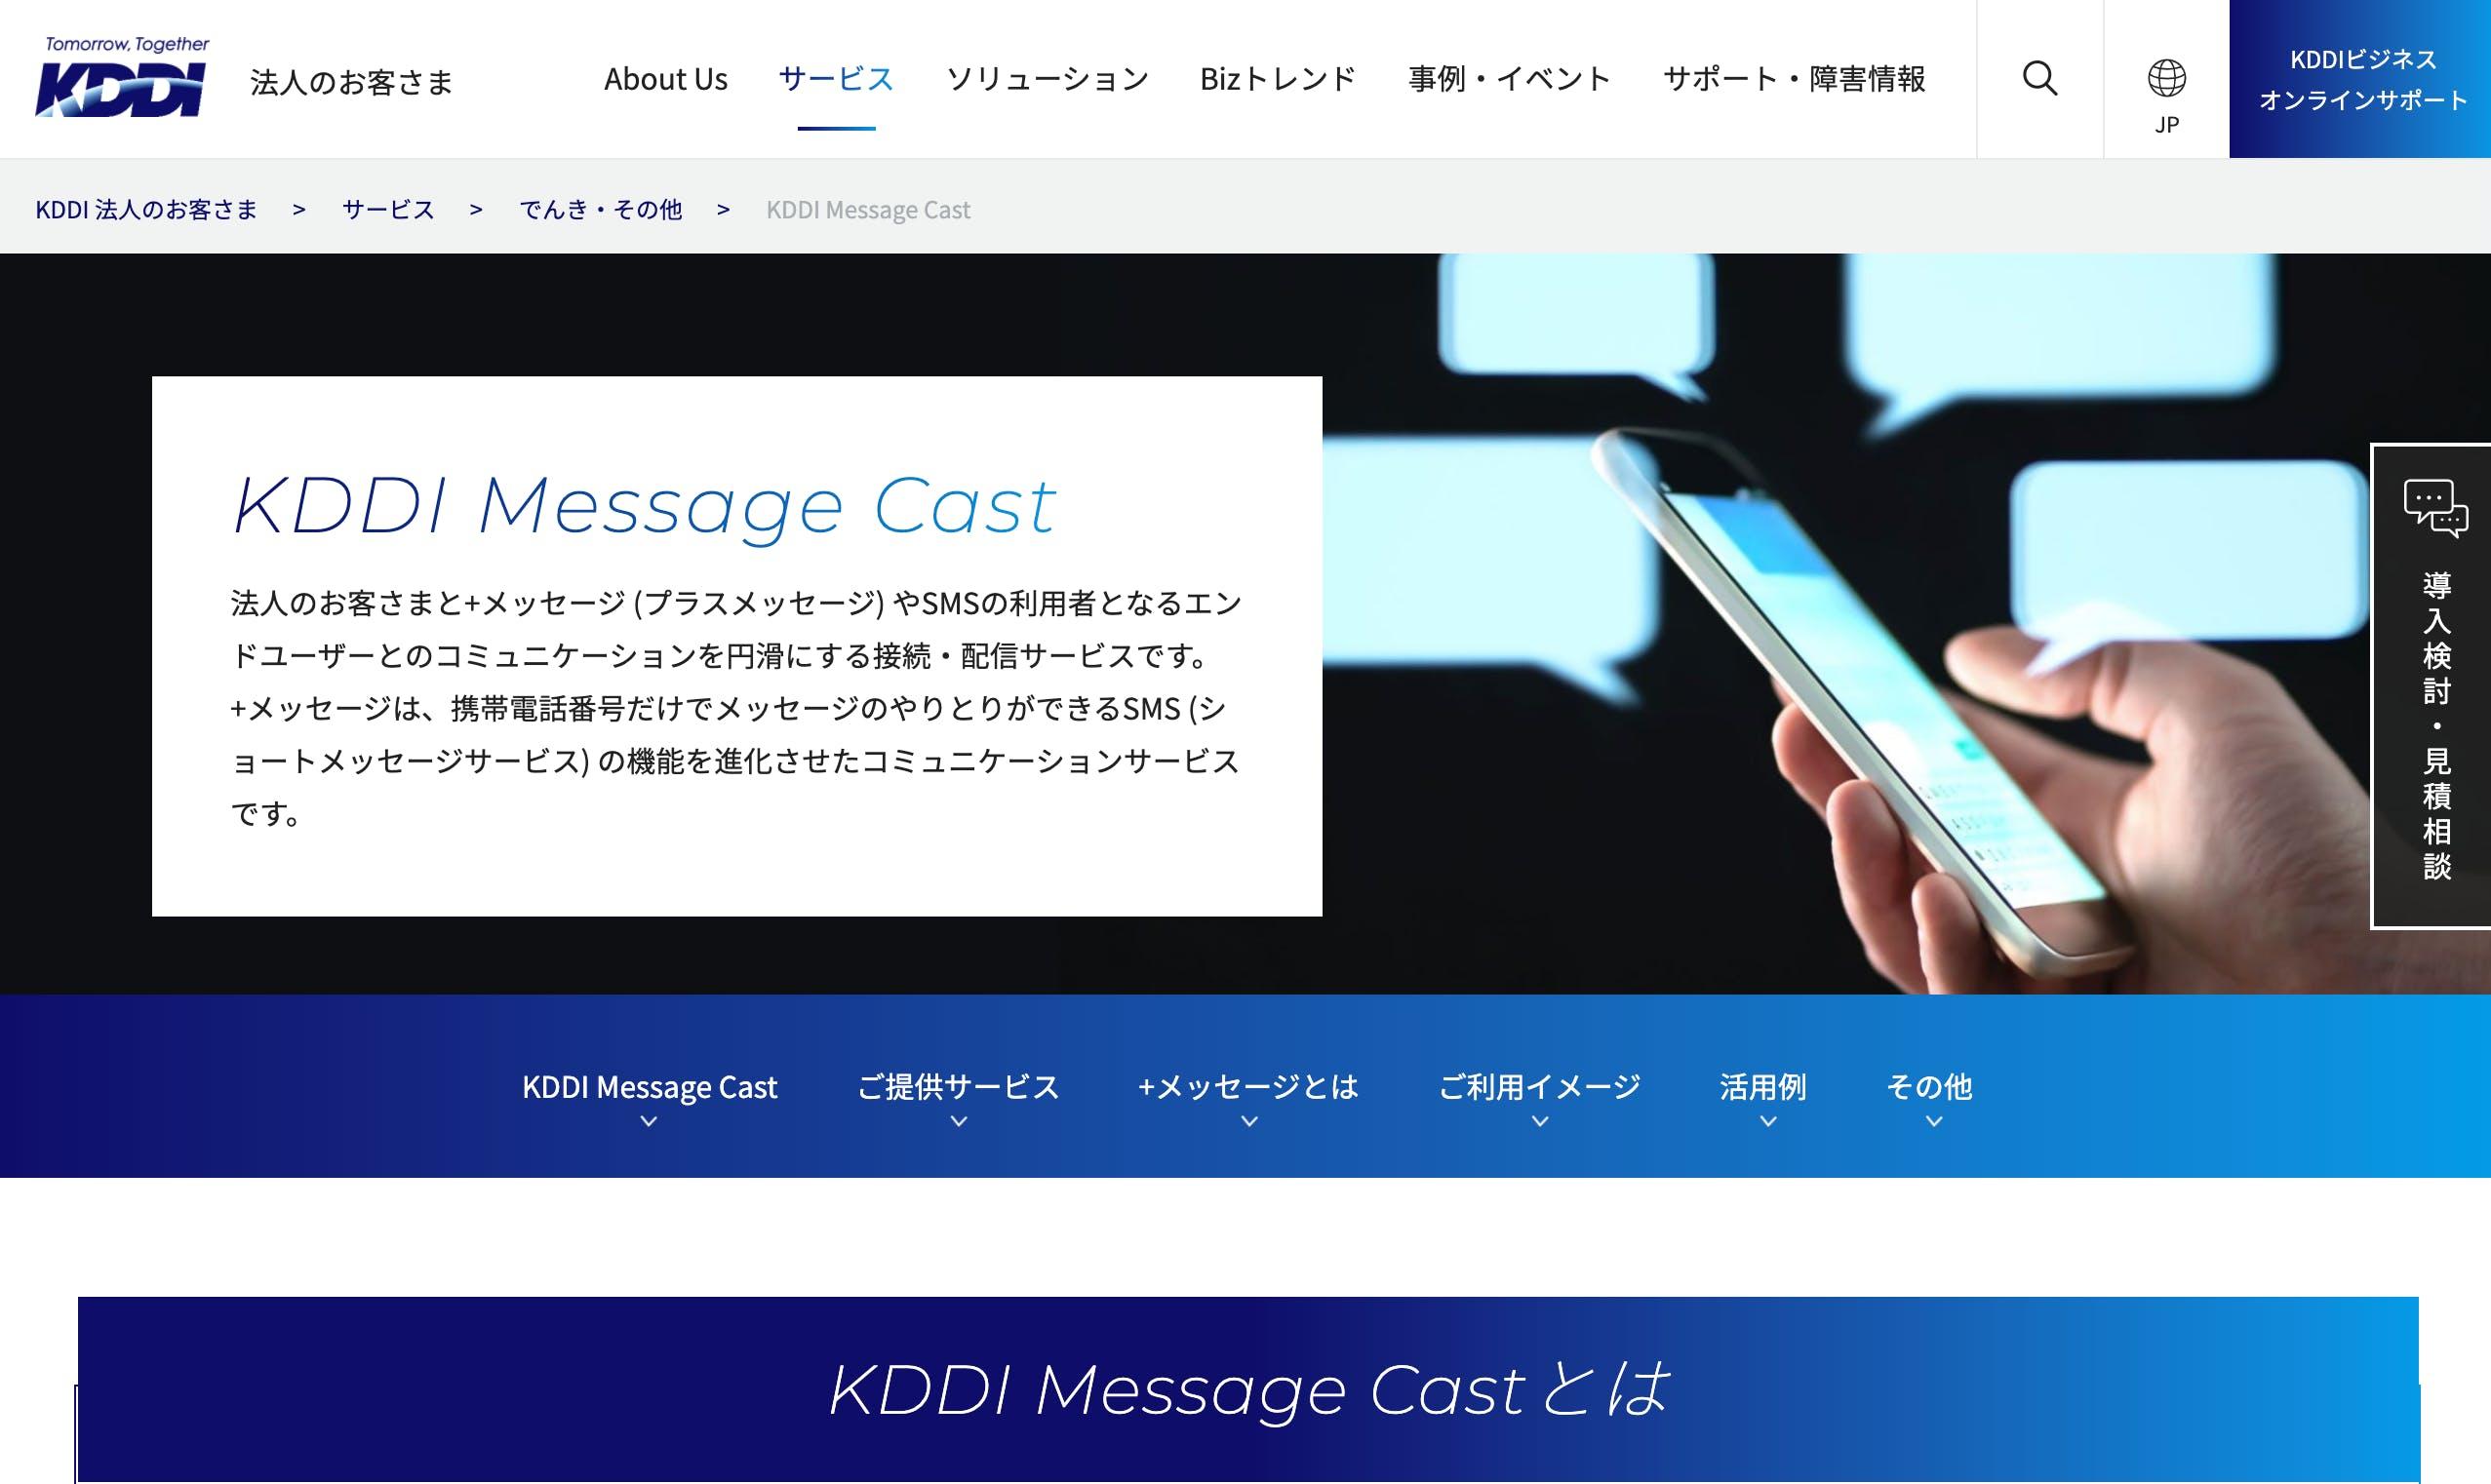 KDDI Message Cast